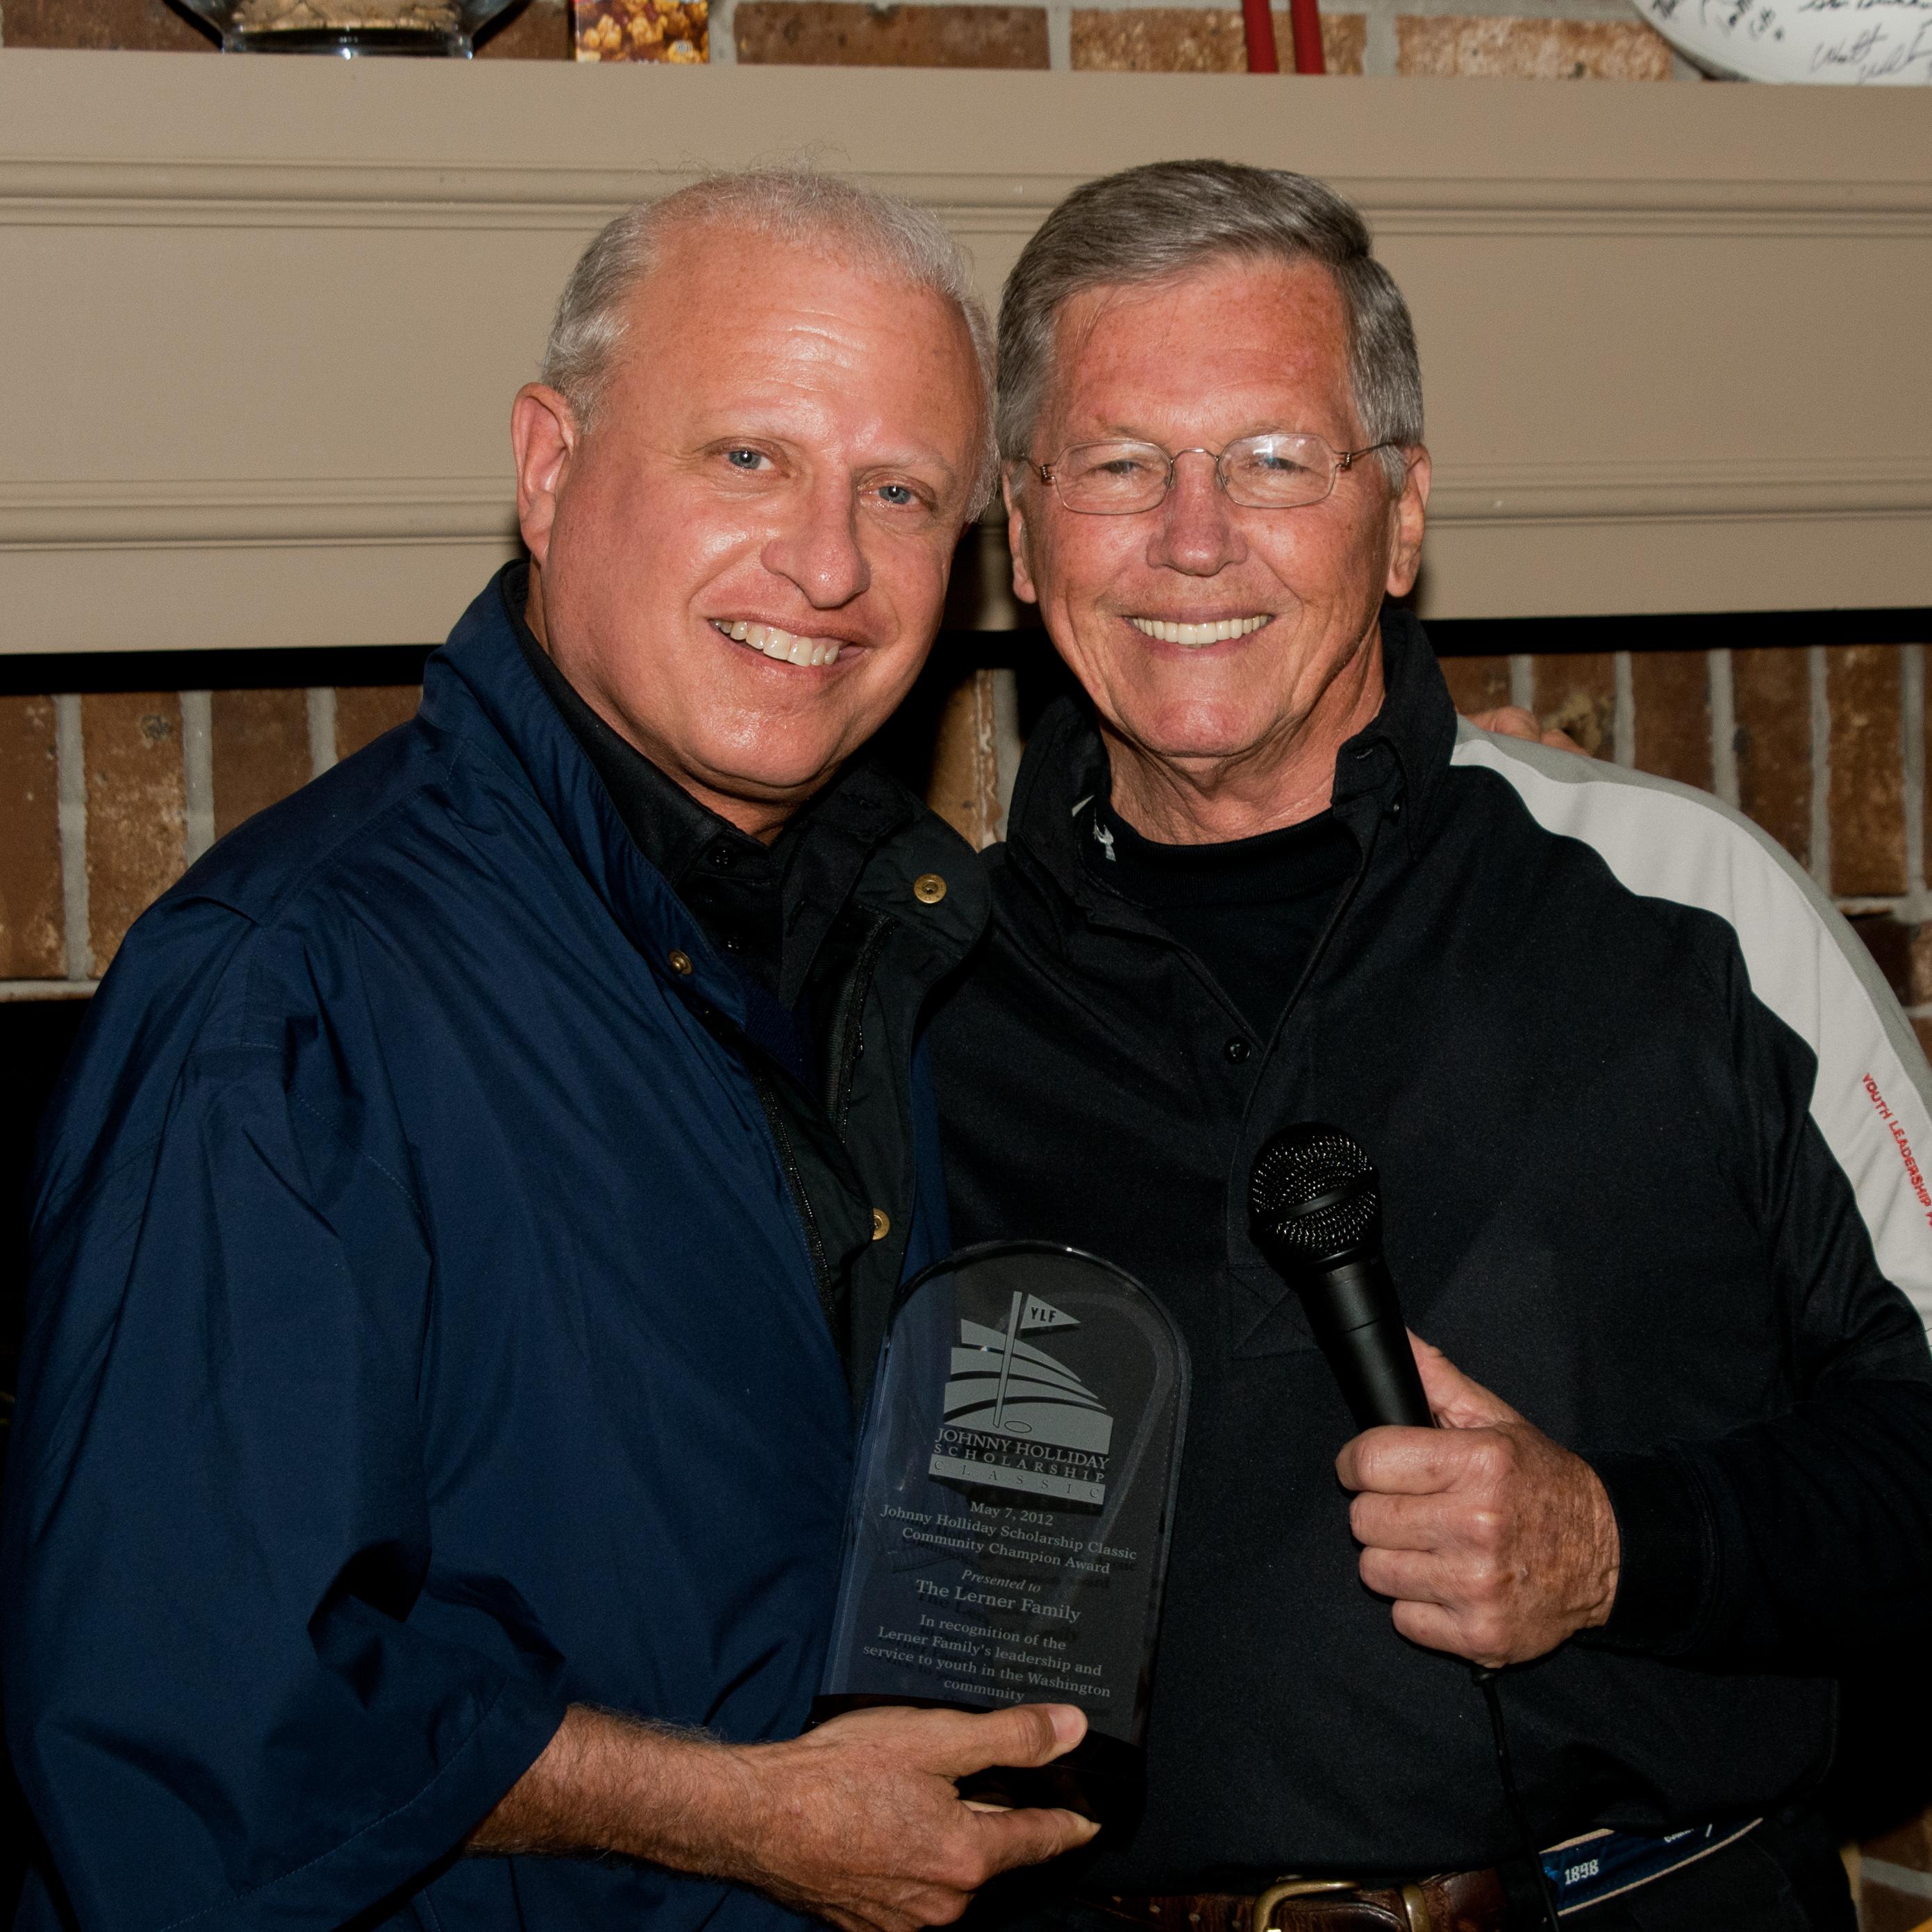 2012 Community Championship honoree